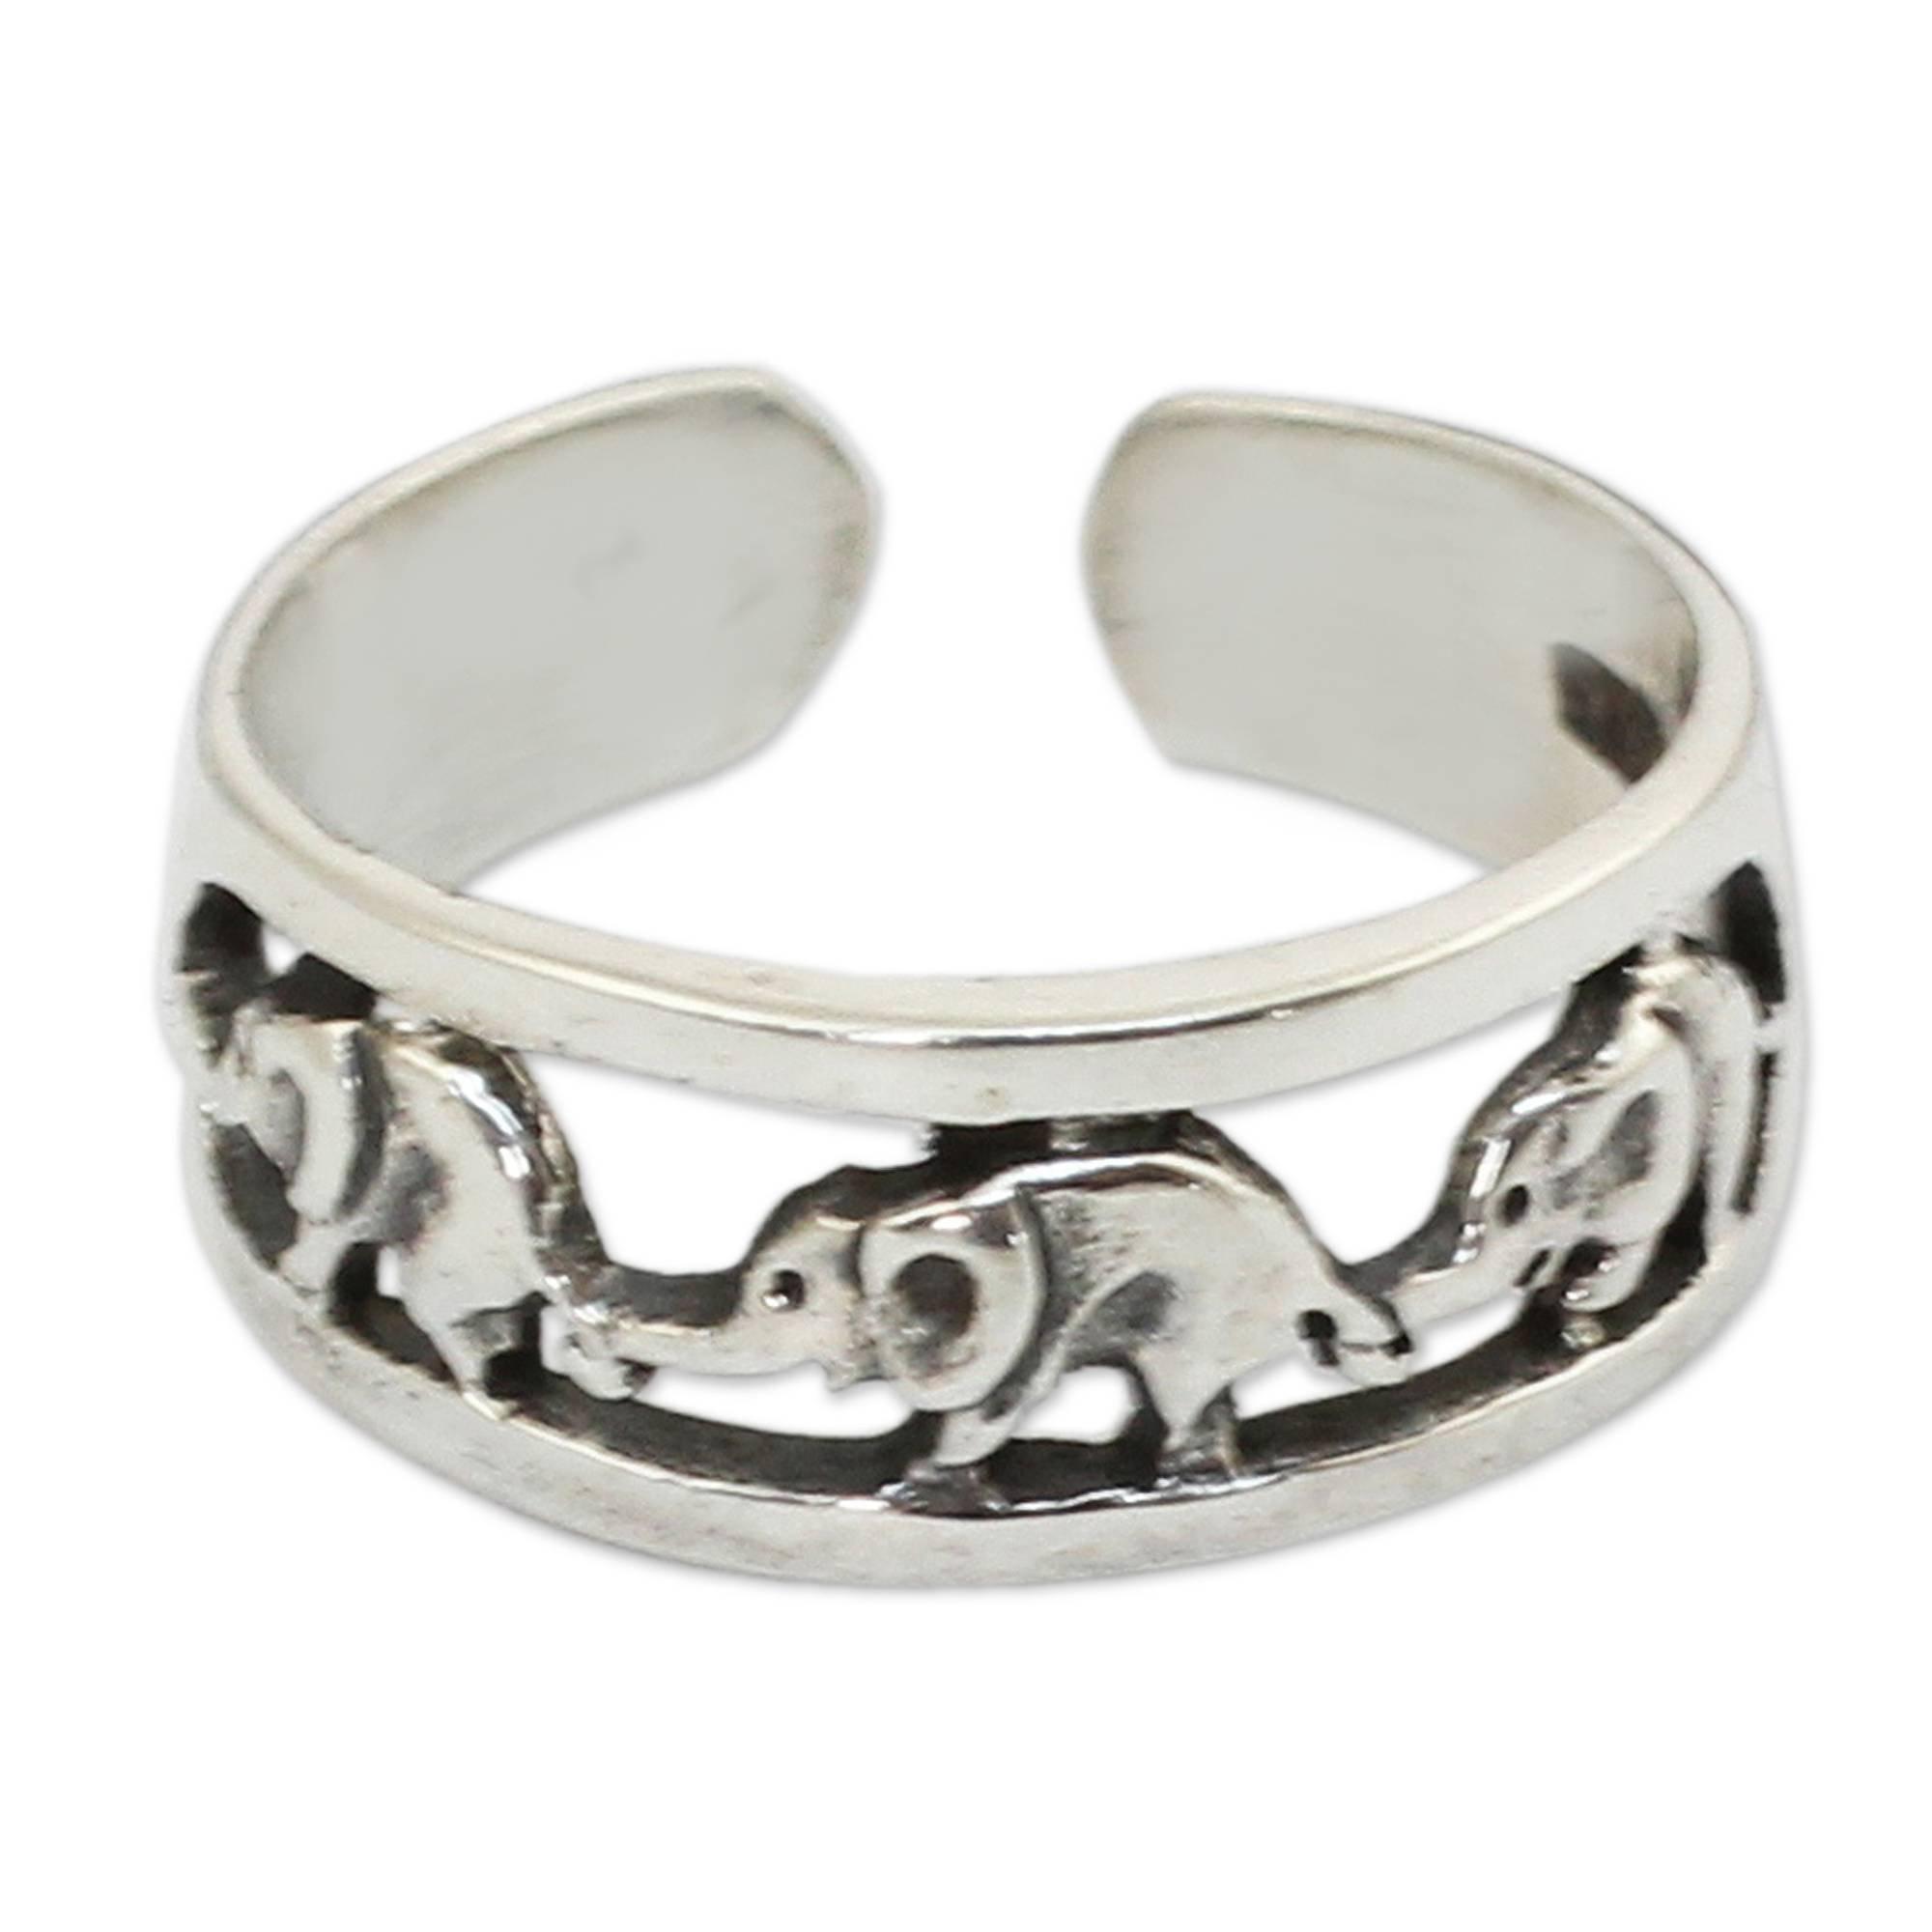 NOVICA .925 Sterling Silver Animal Themed Adjustable Toe Ring 'Elephant Walk', One Size